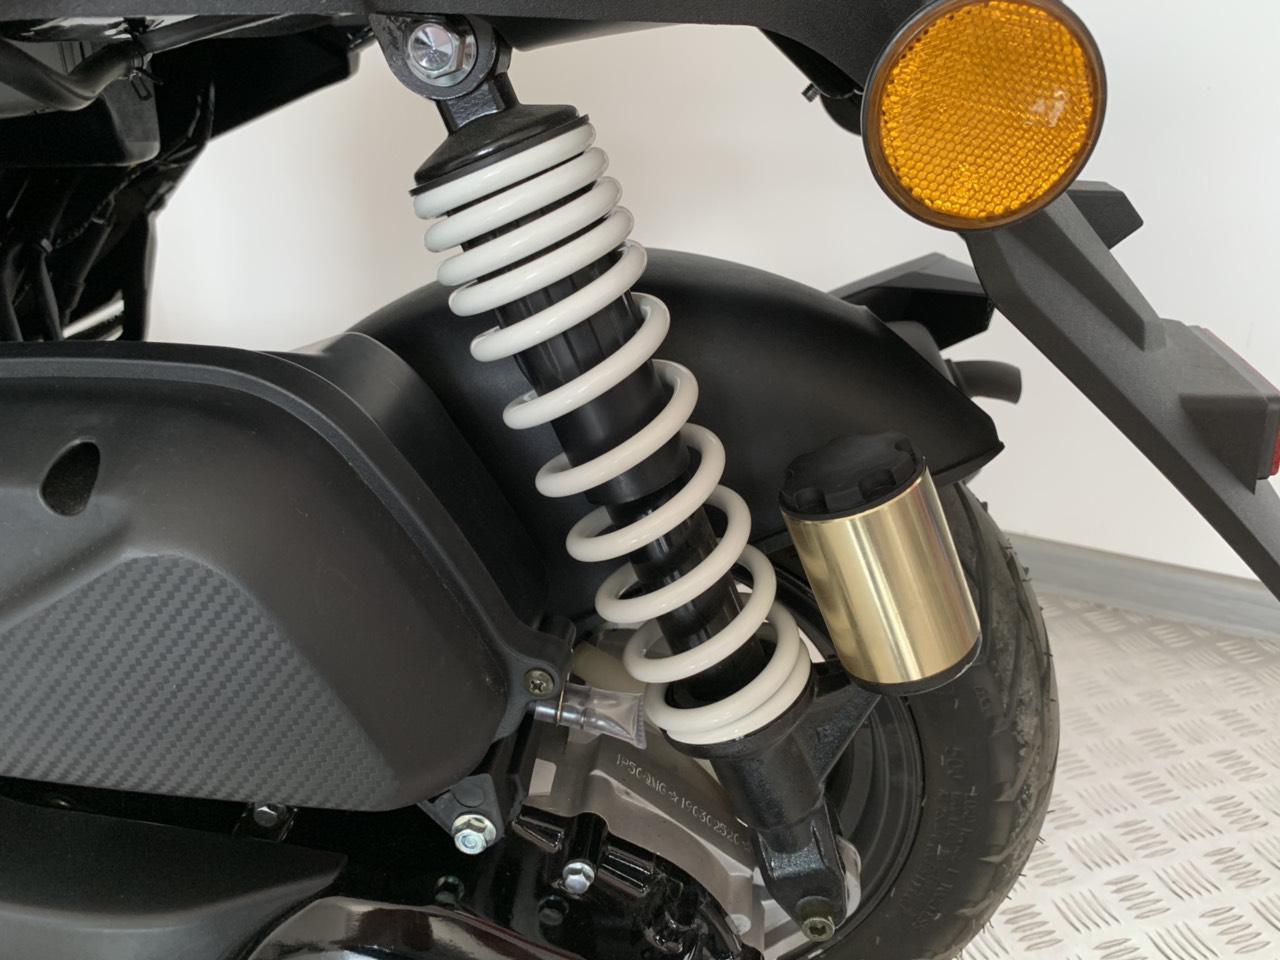 СКУТЕР FADA JOG (YB110QT-3) ― Артмото - купить квадроцикл в украине и харькове, мотоцикл, снегоход, скутер, мопед, электромобиль